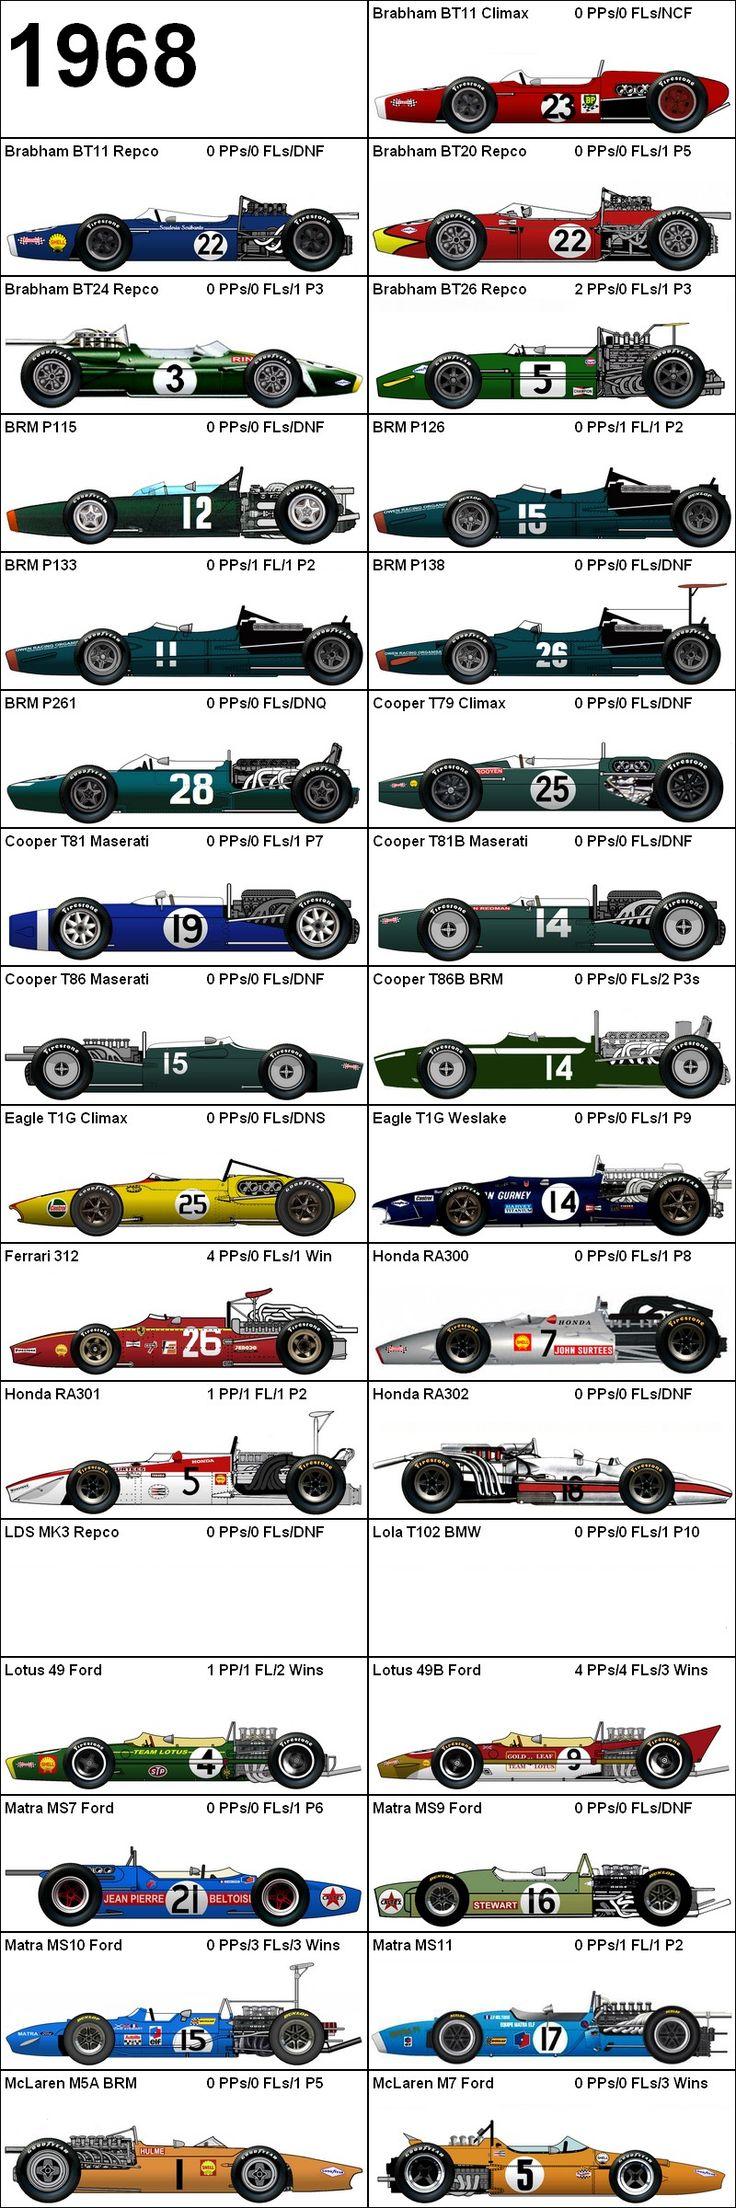 Formula One Grand Prix 1968 Cars